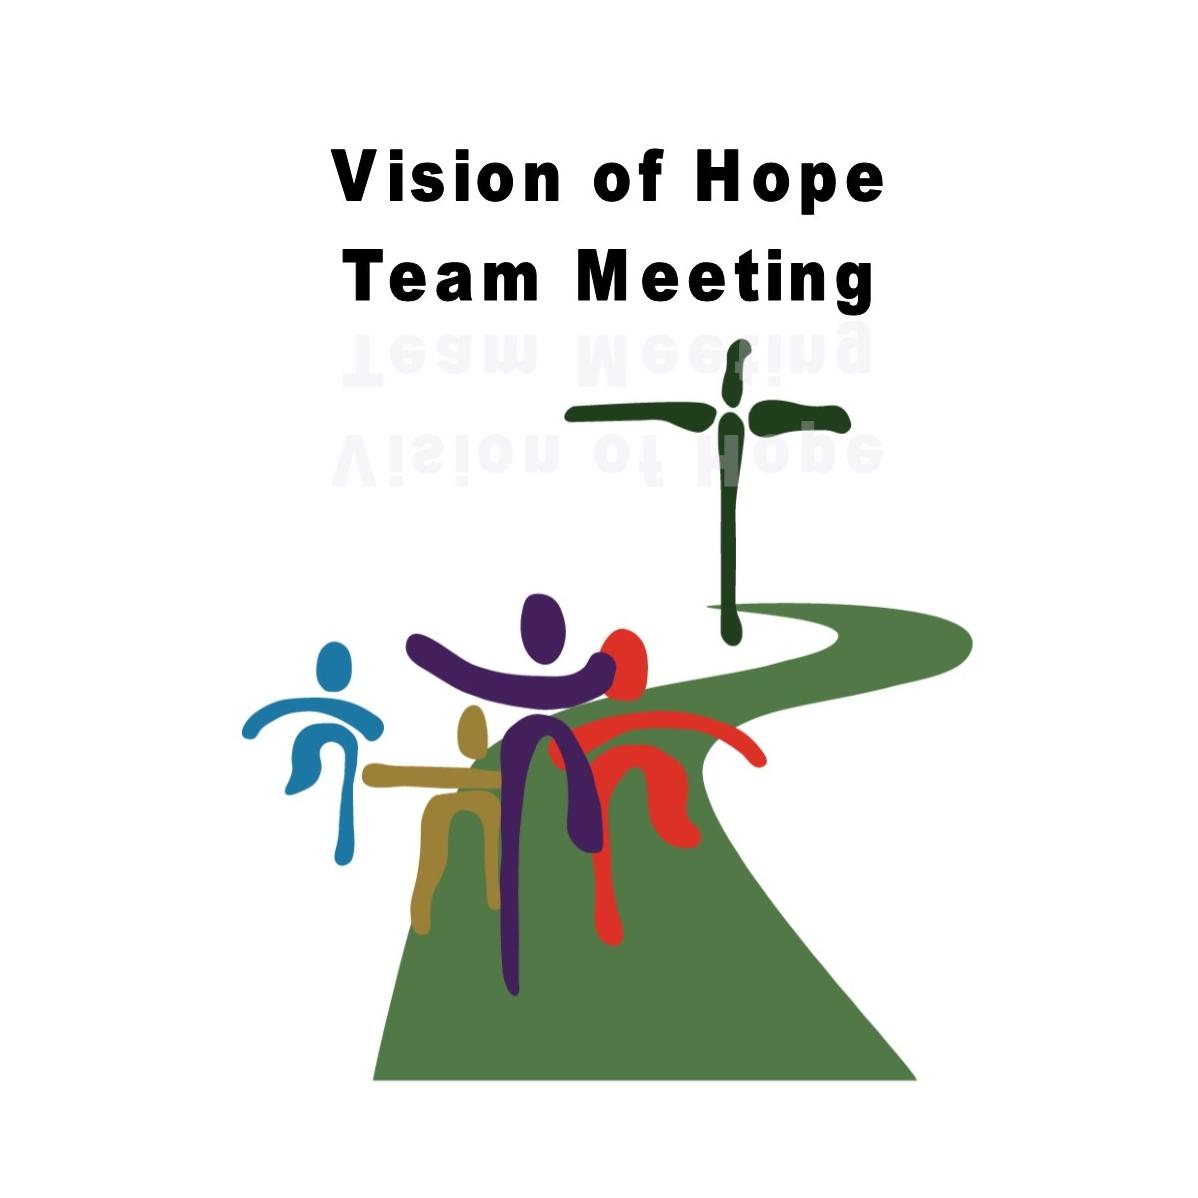 Vision of Hope Team